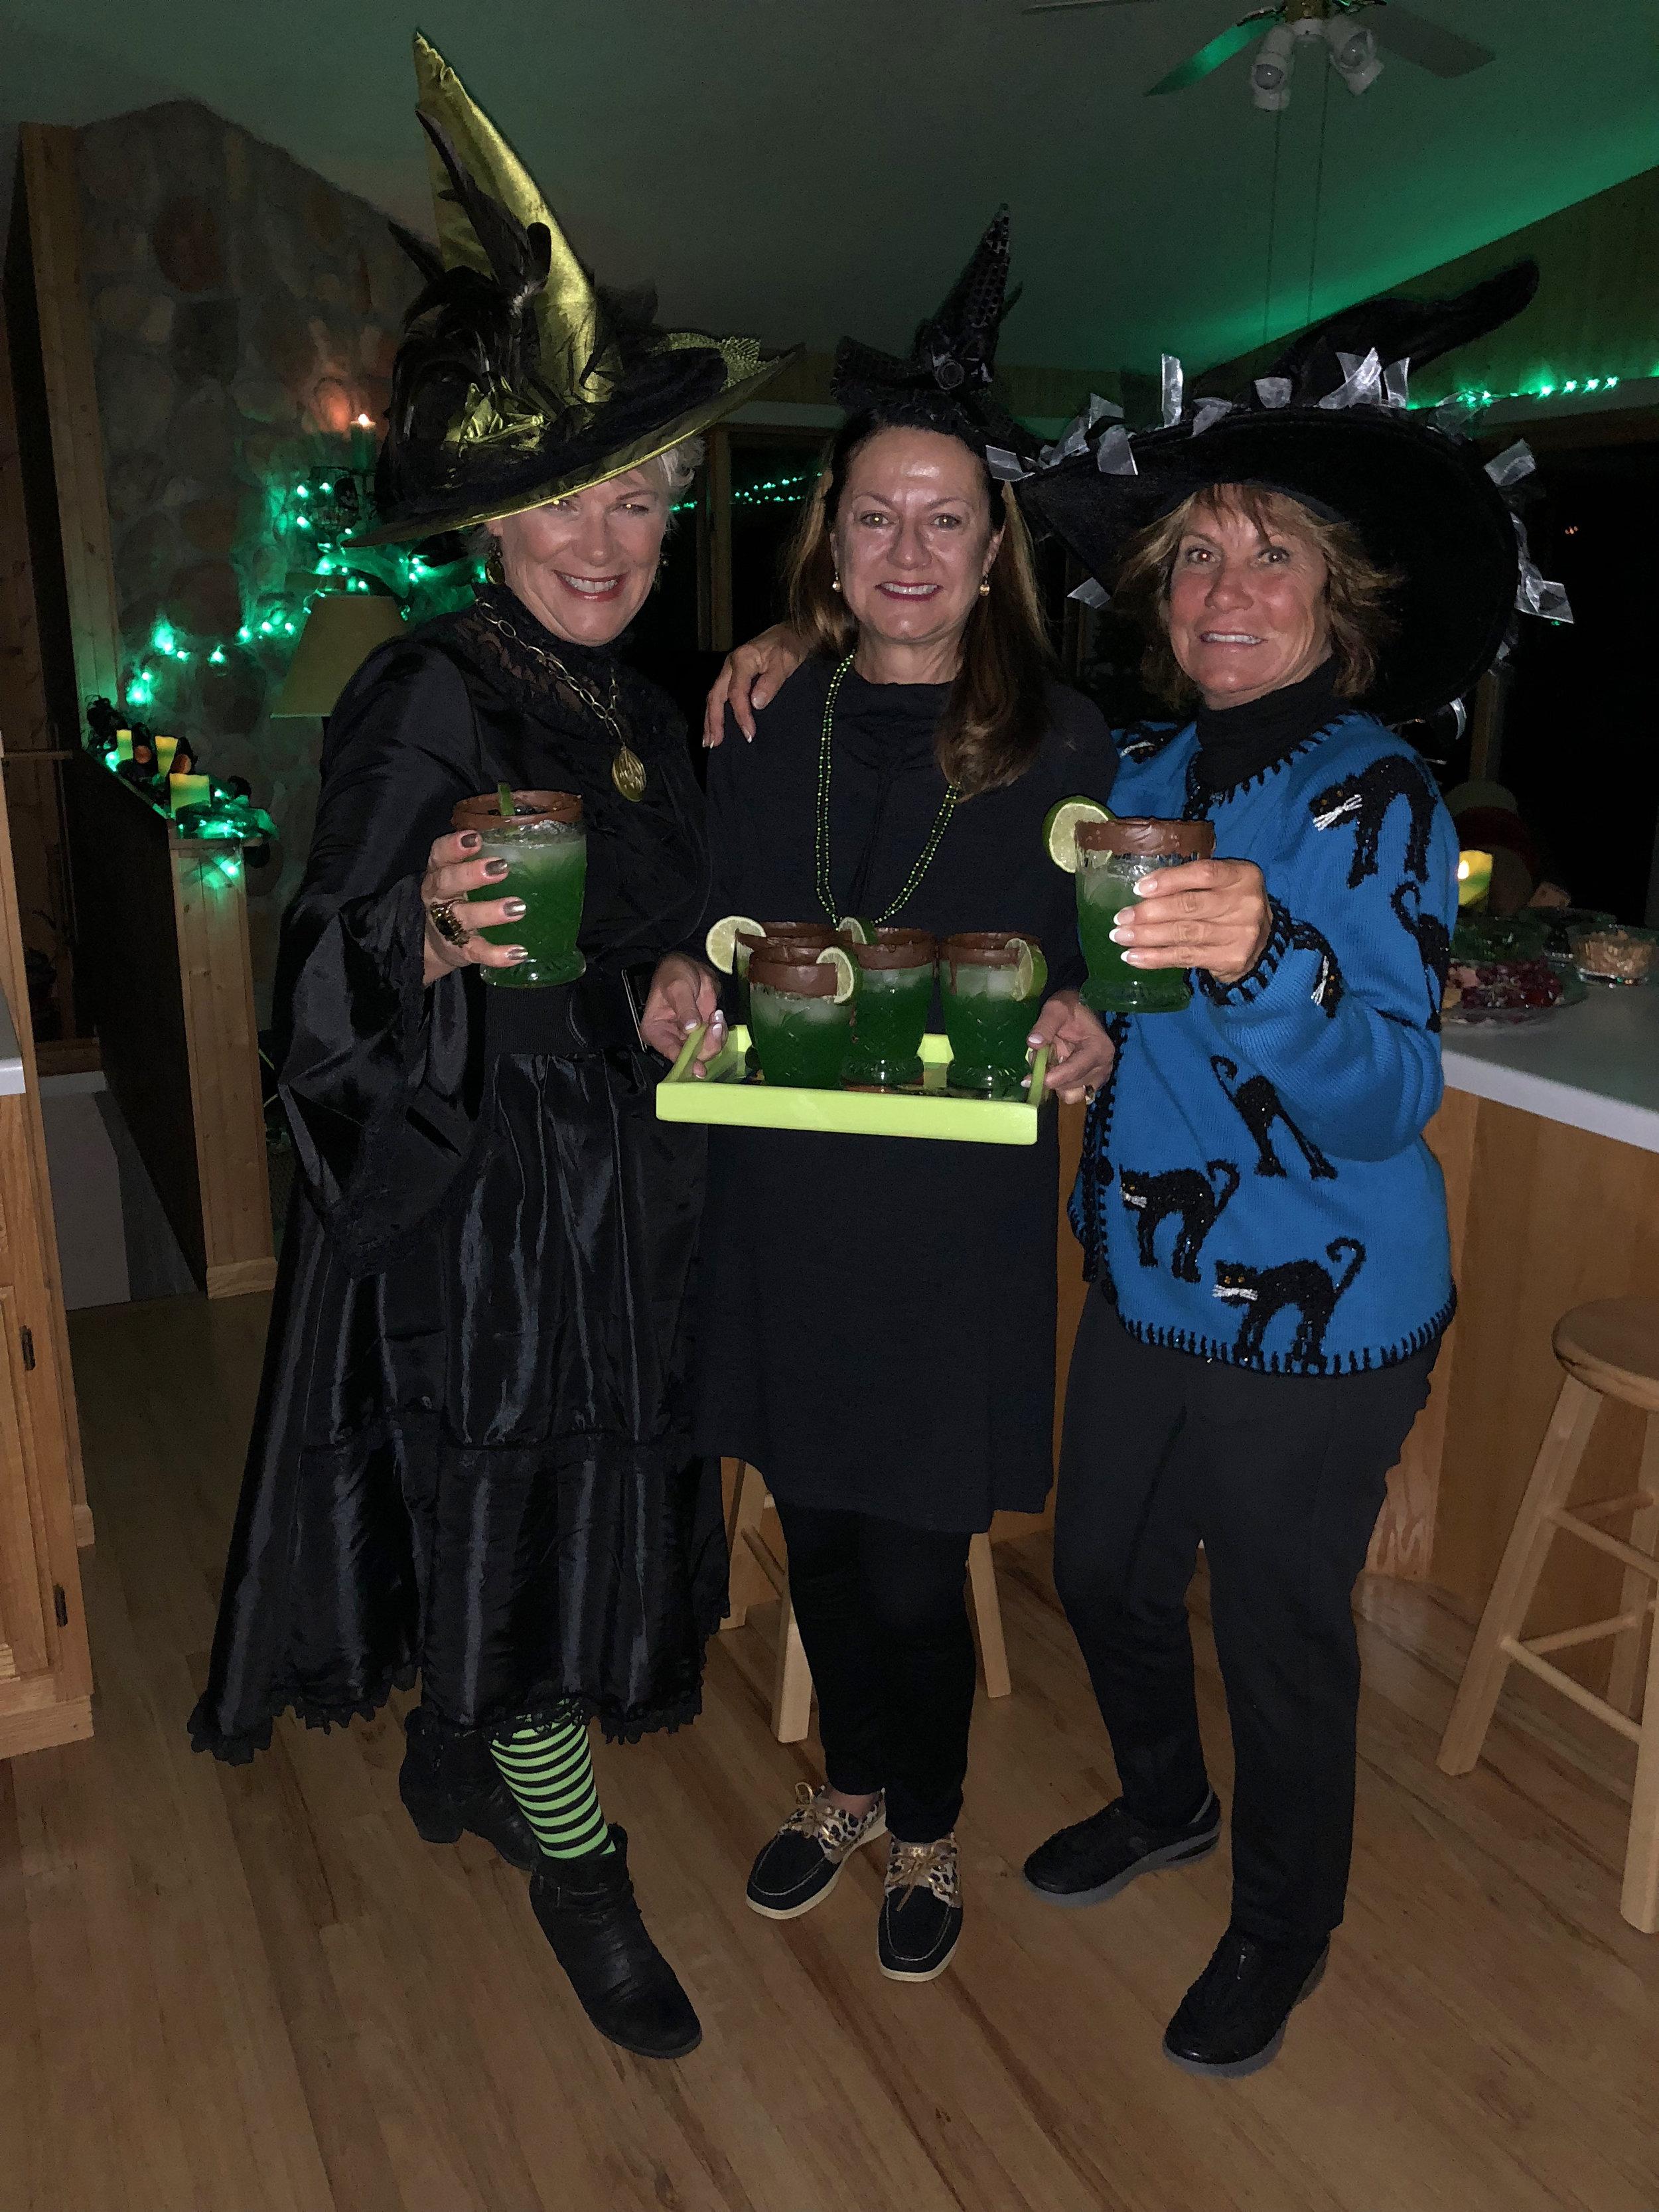 teri_w3bookclub_Wicked_halloween_spiritedtable_photo61.jpg